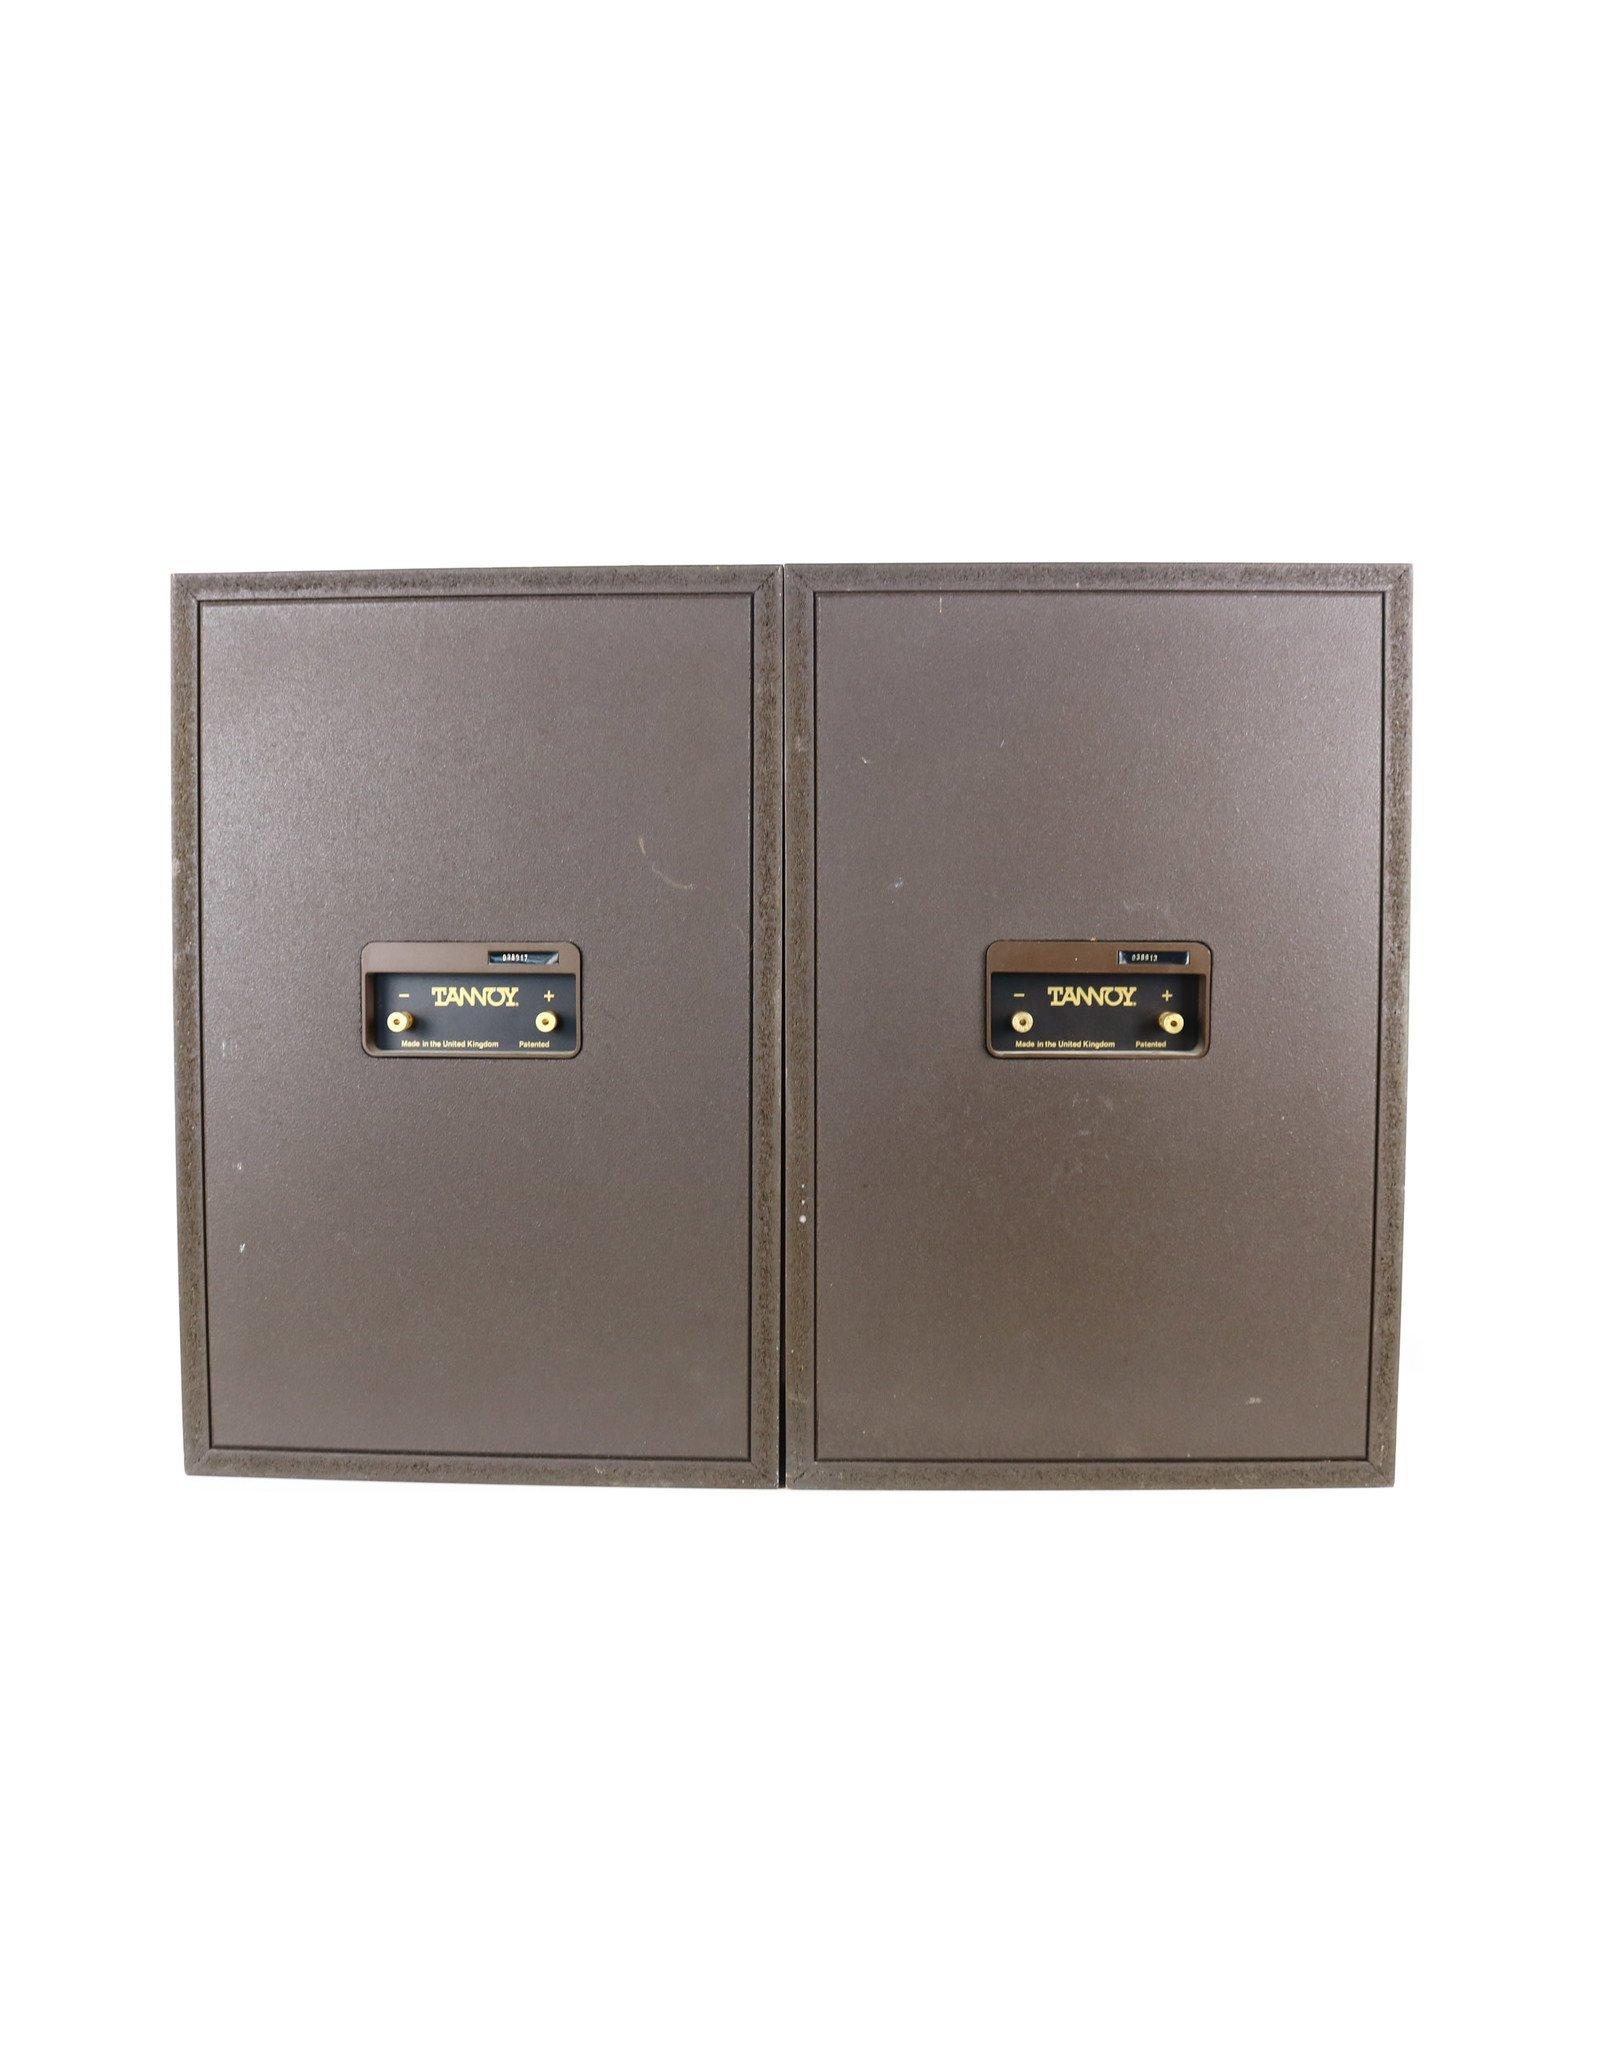 Tannoy Tannoy SGM 10b Gold Monitor Bookshelf Speakers USED